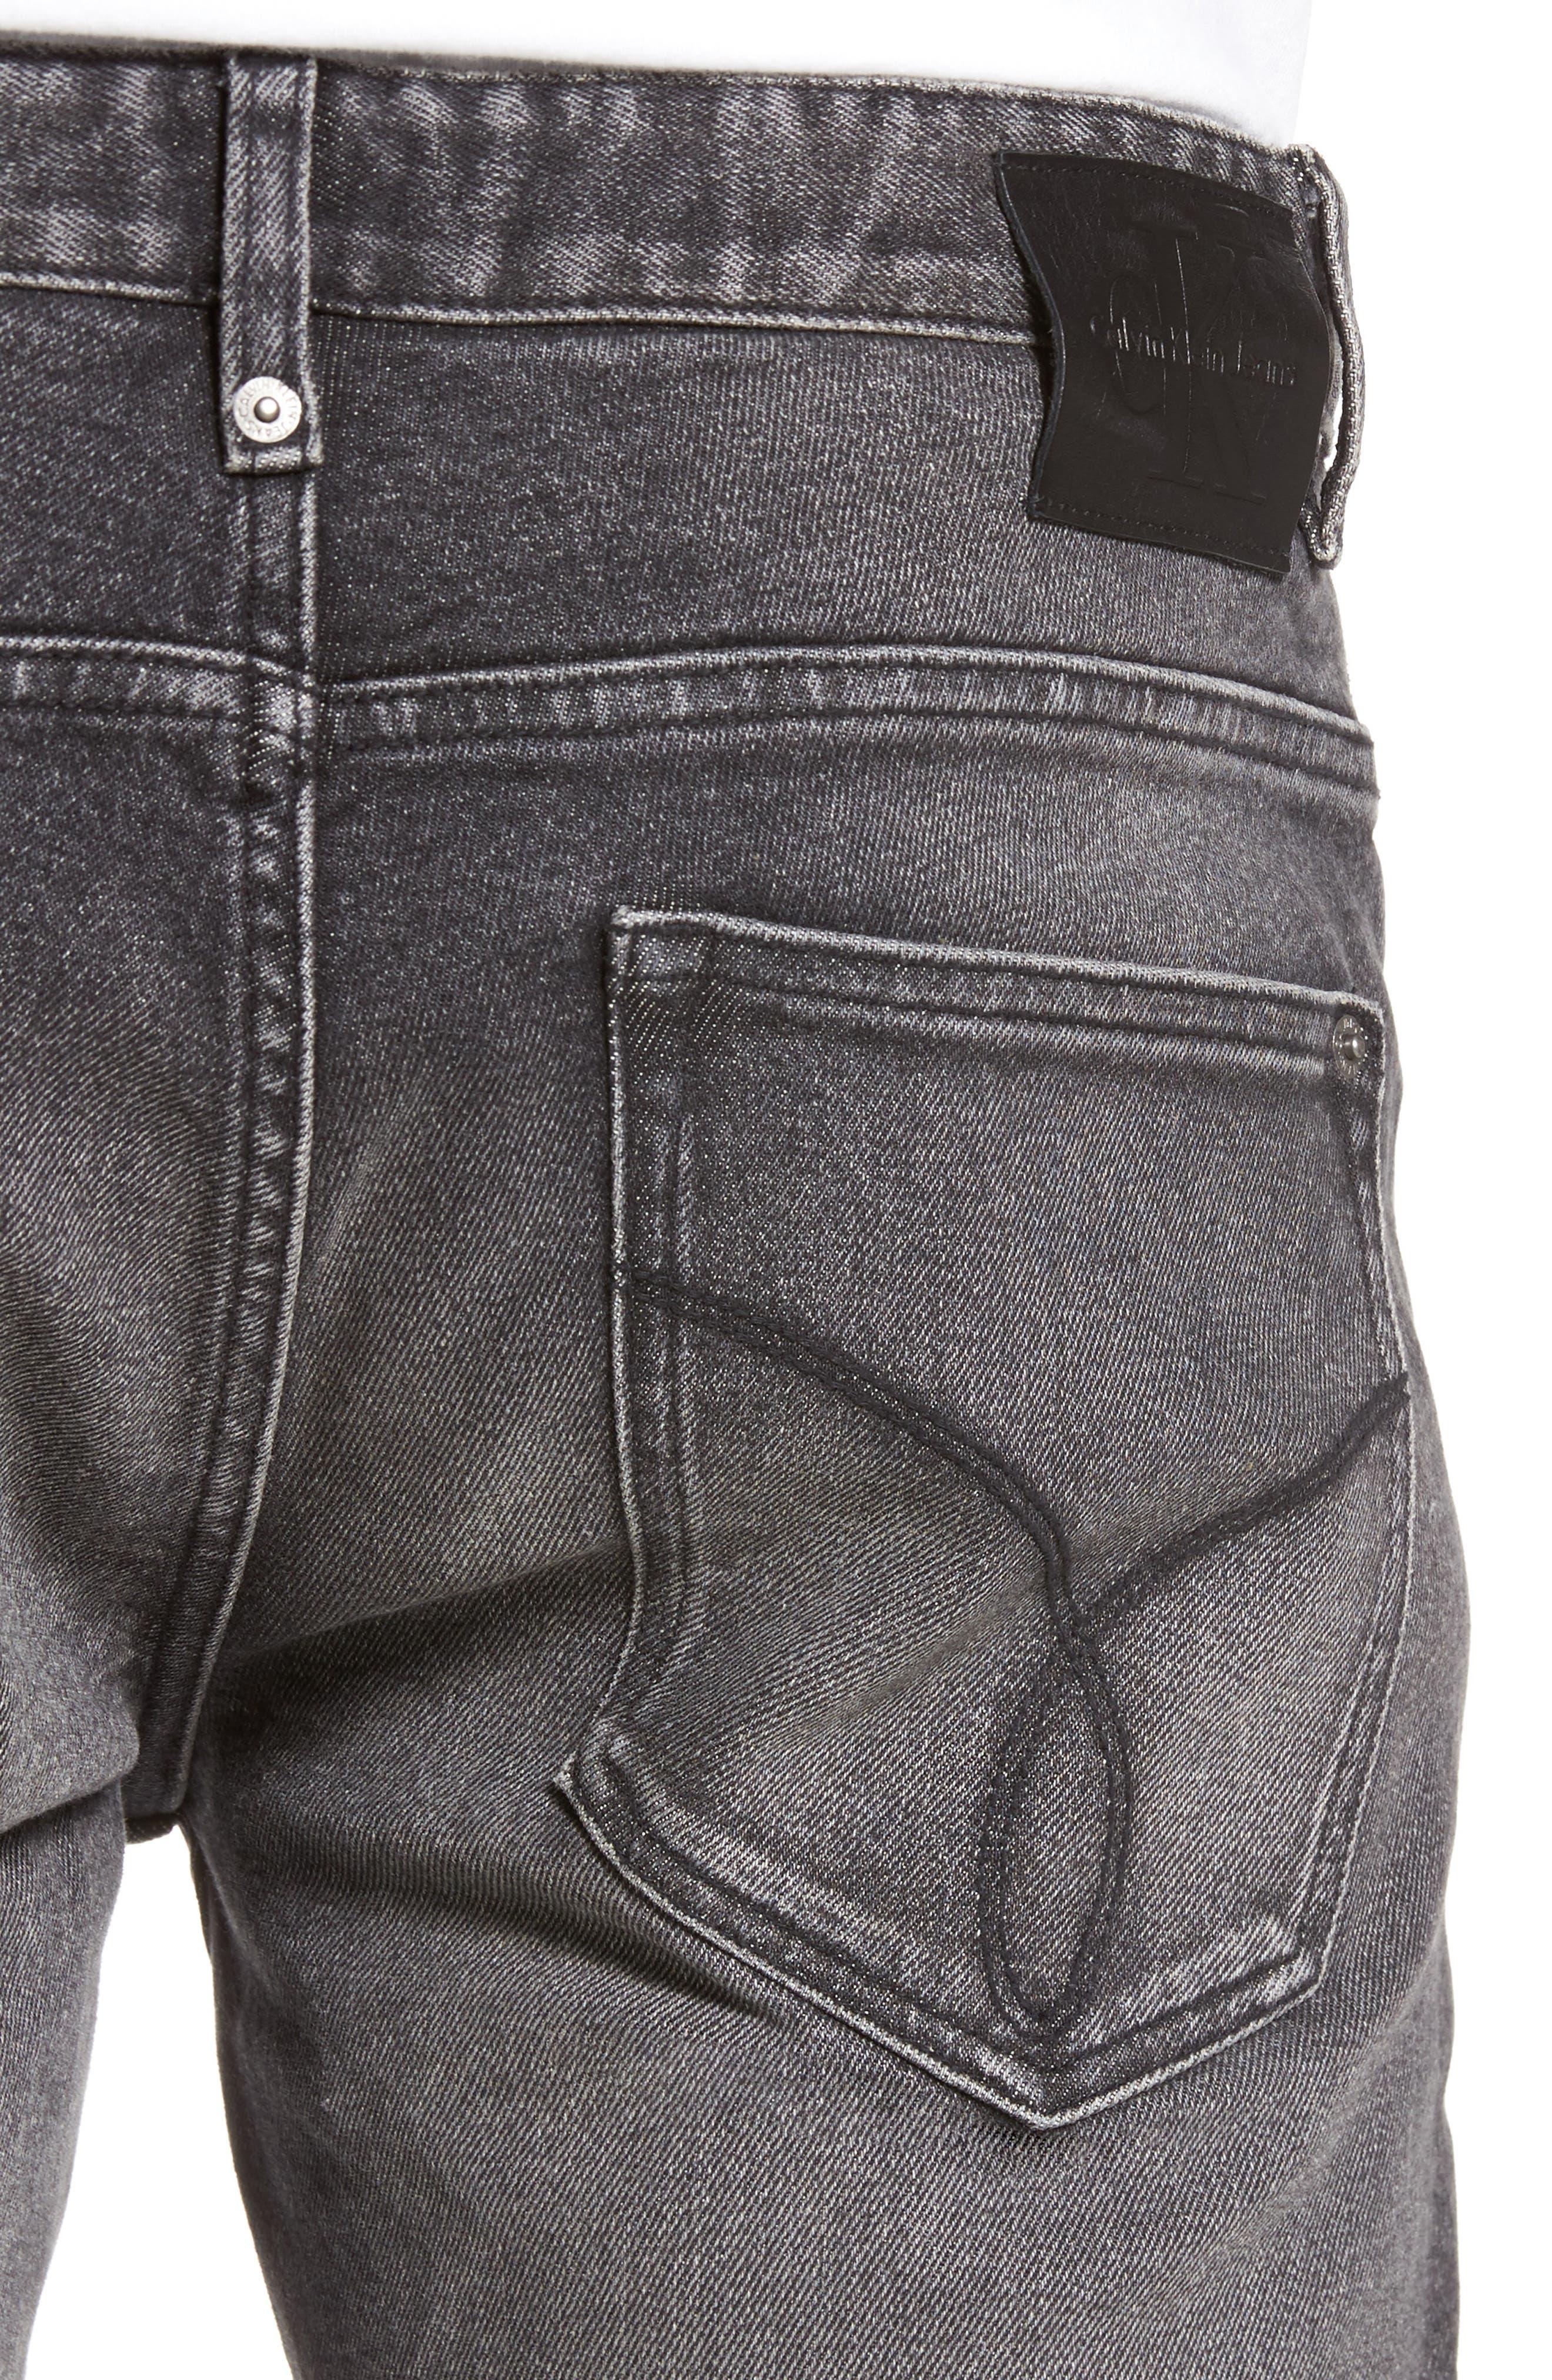 Skinny Jeans,                             Alternate thumbnail 4, color,                             001